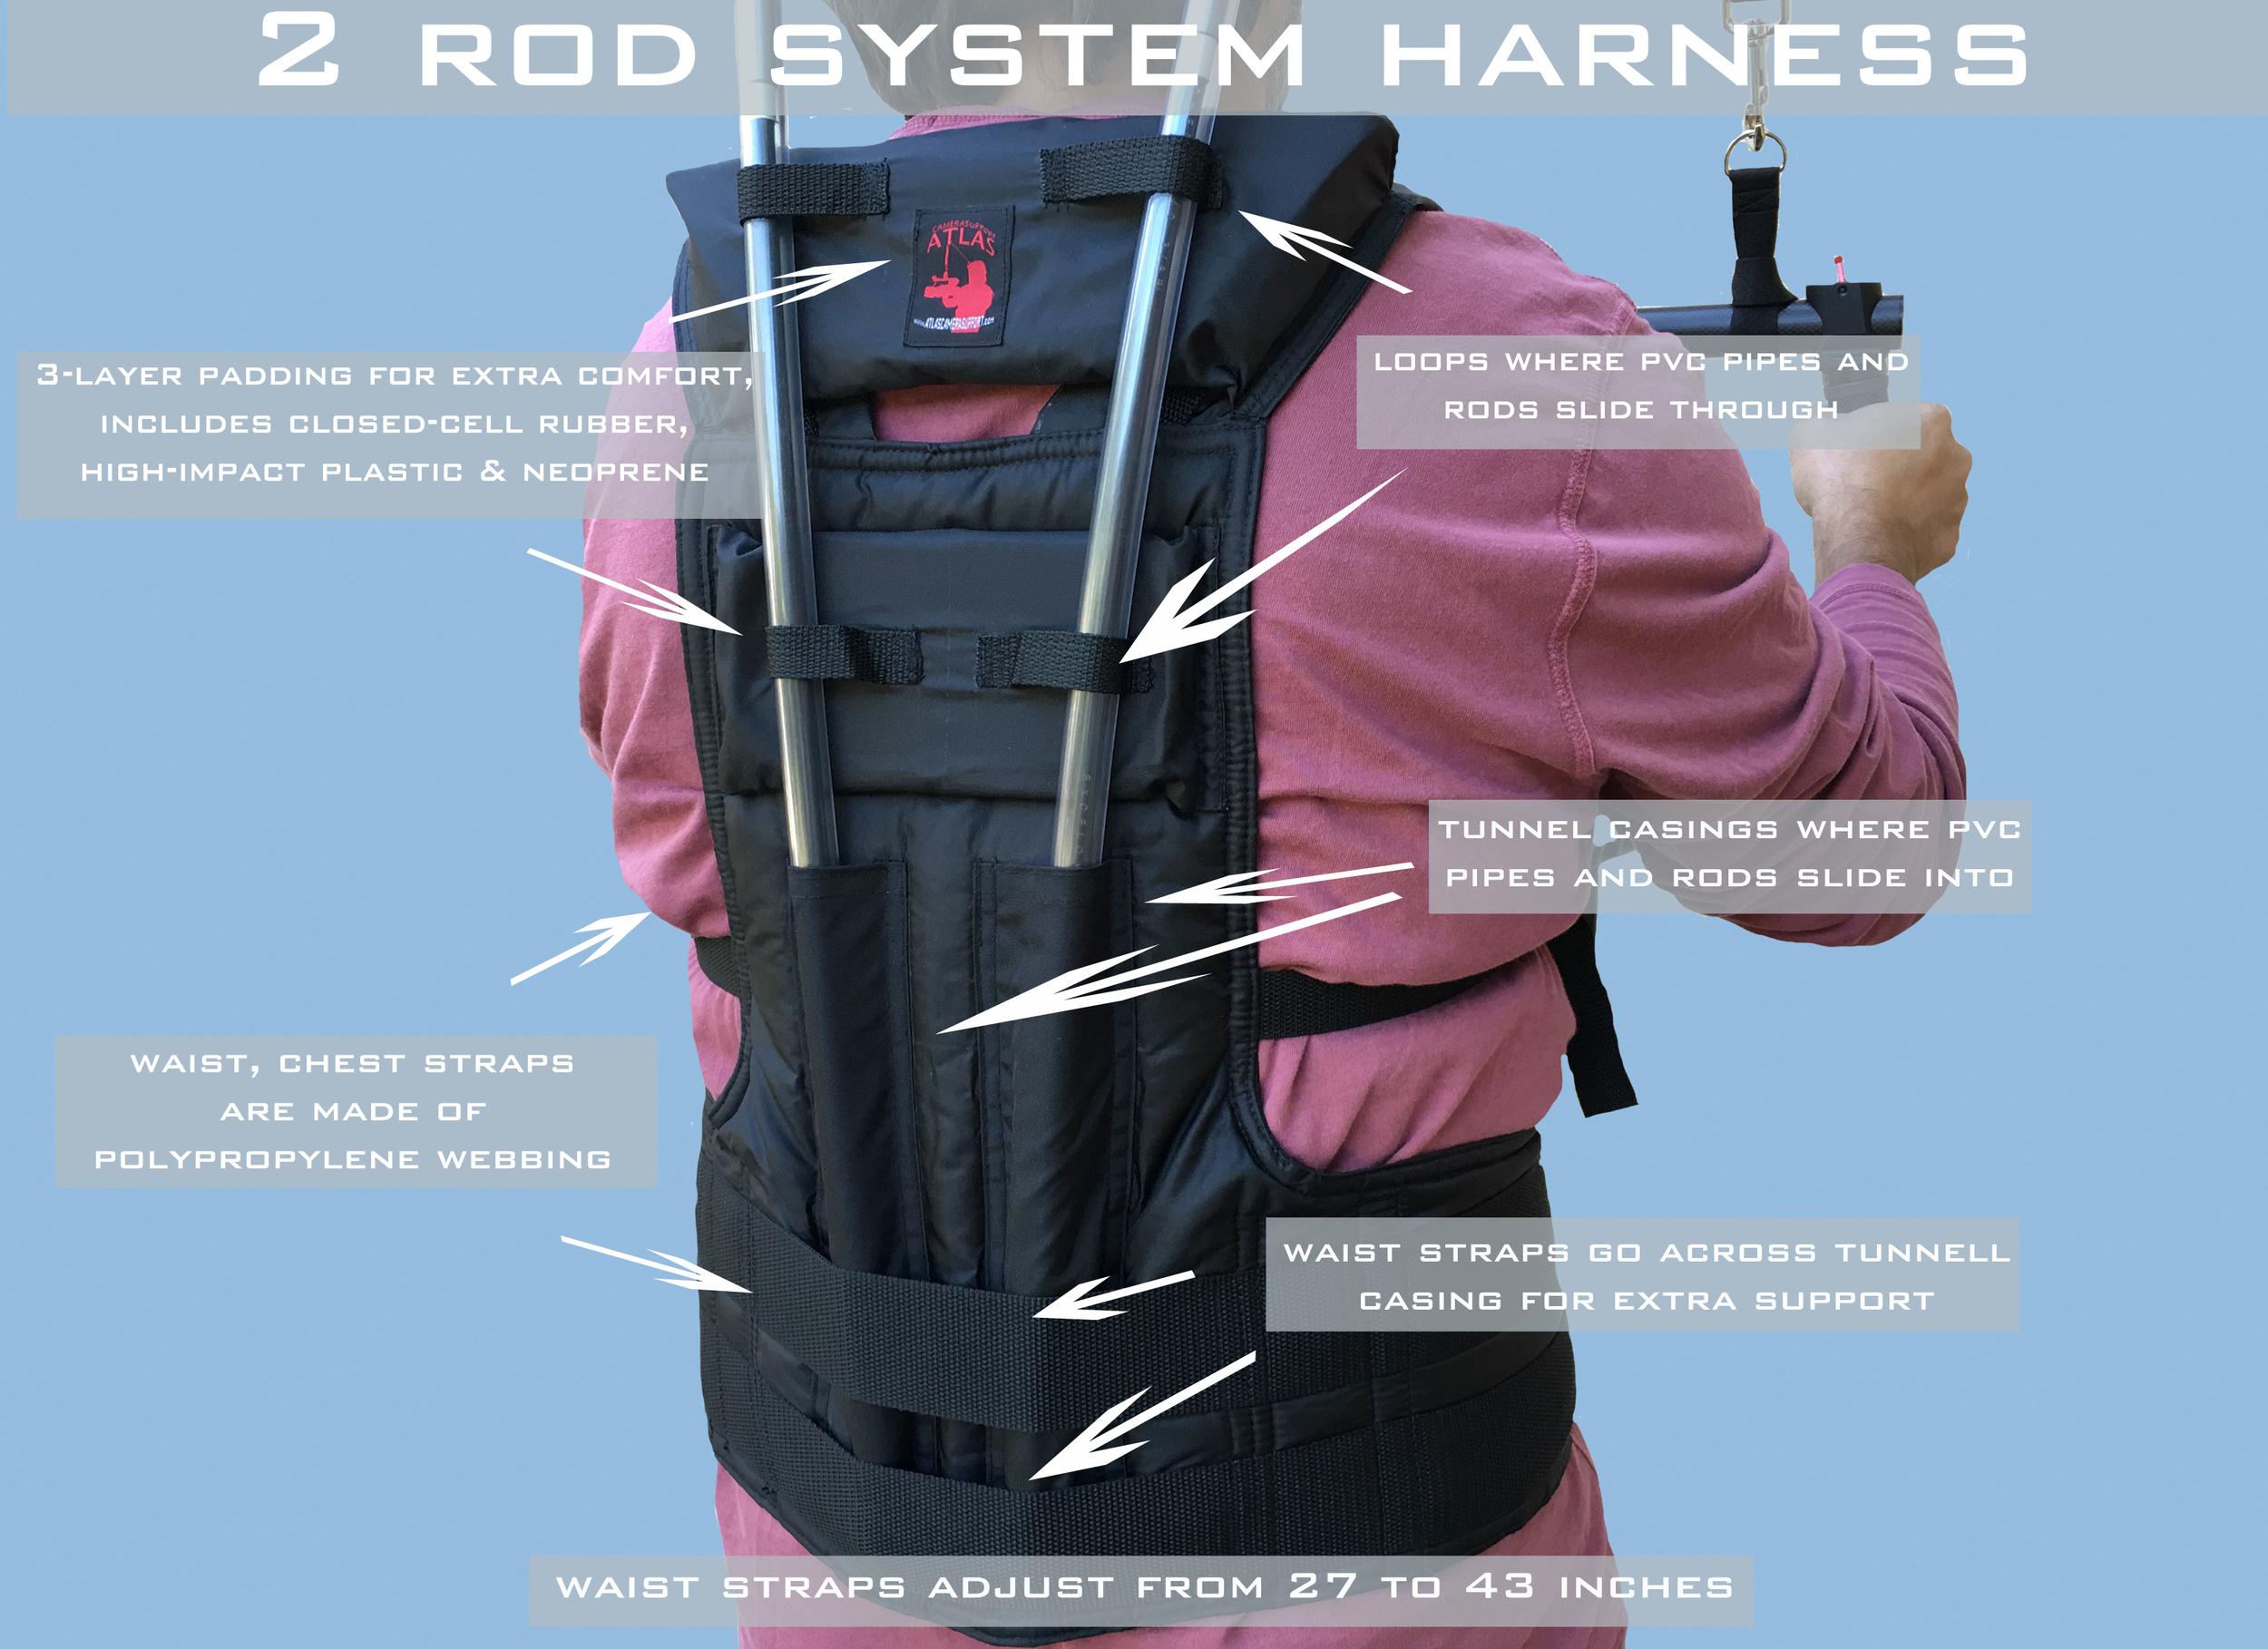 2-rod harness back.jpg